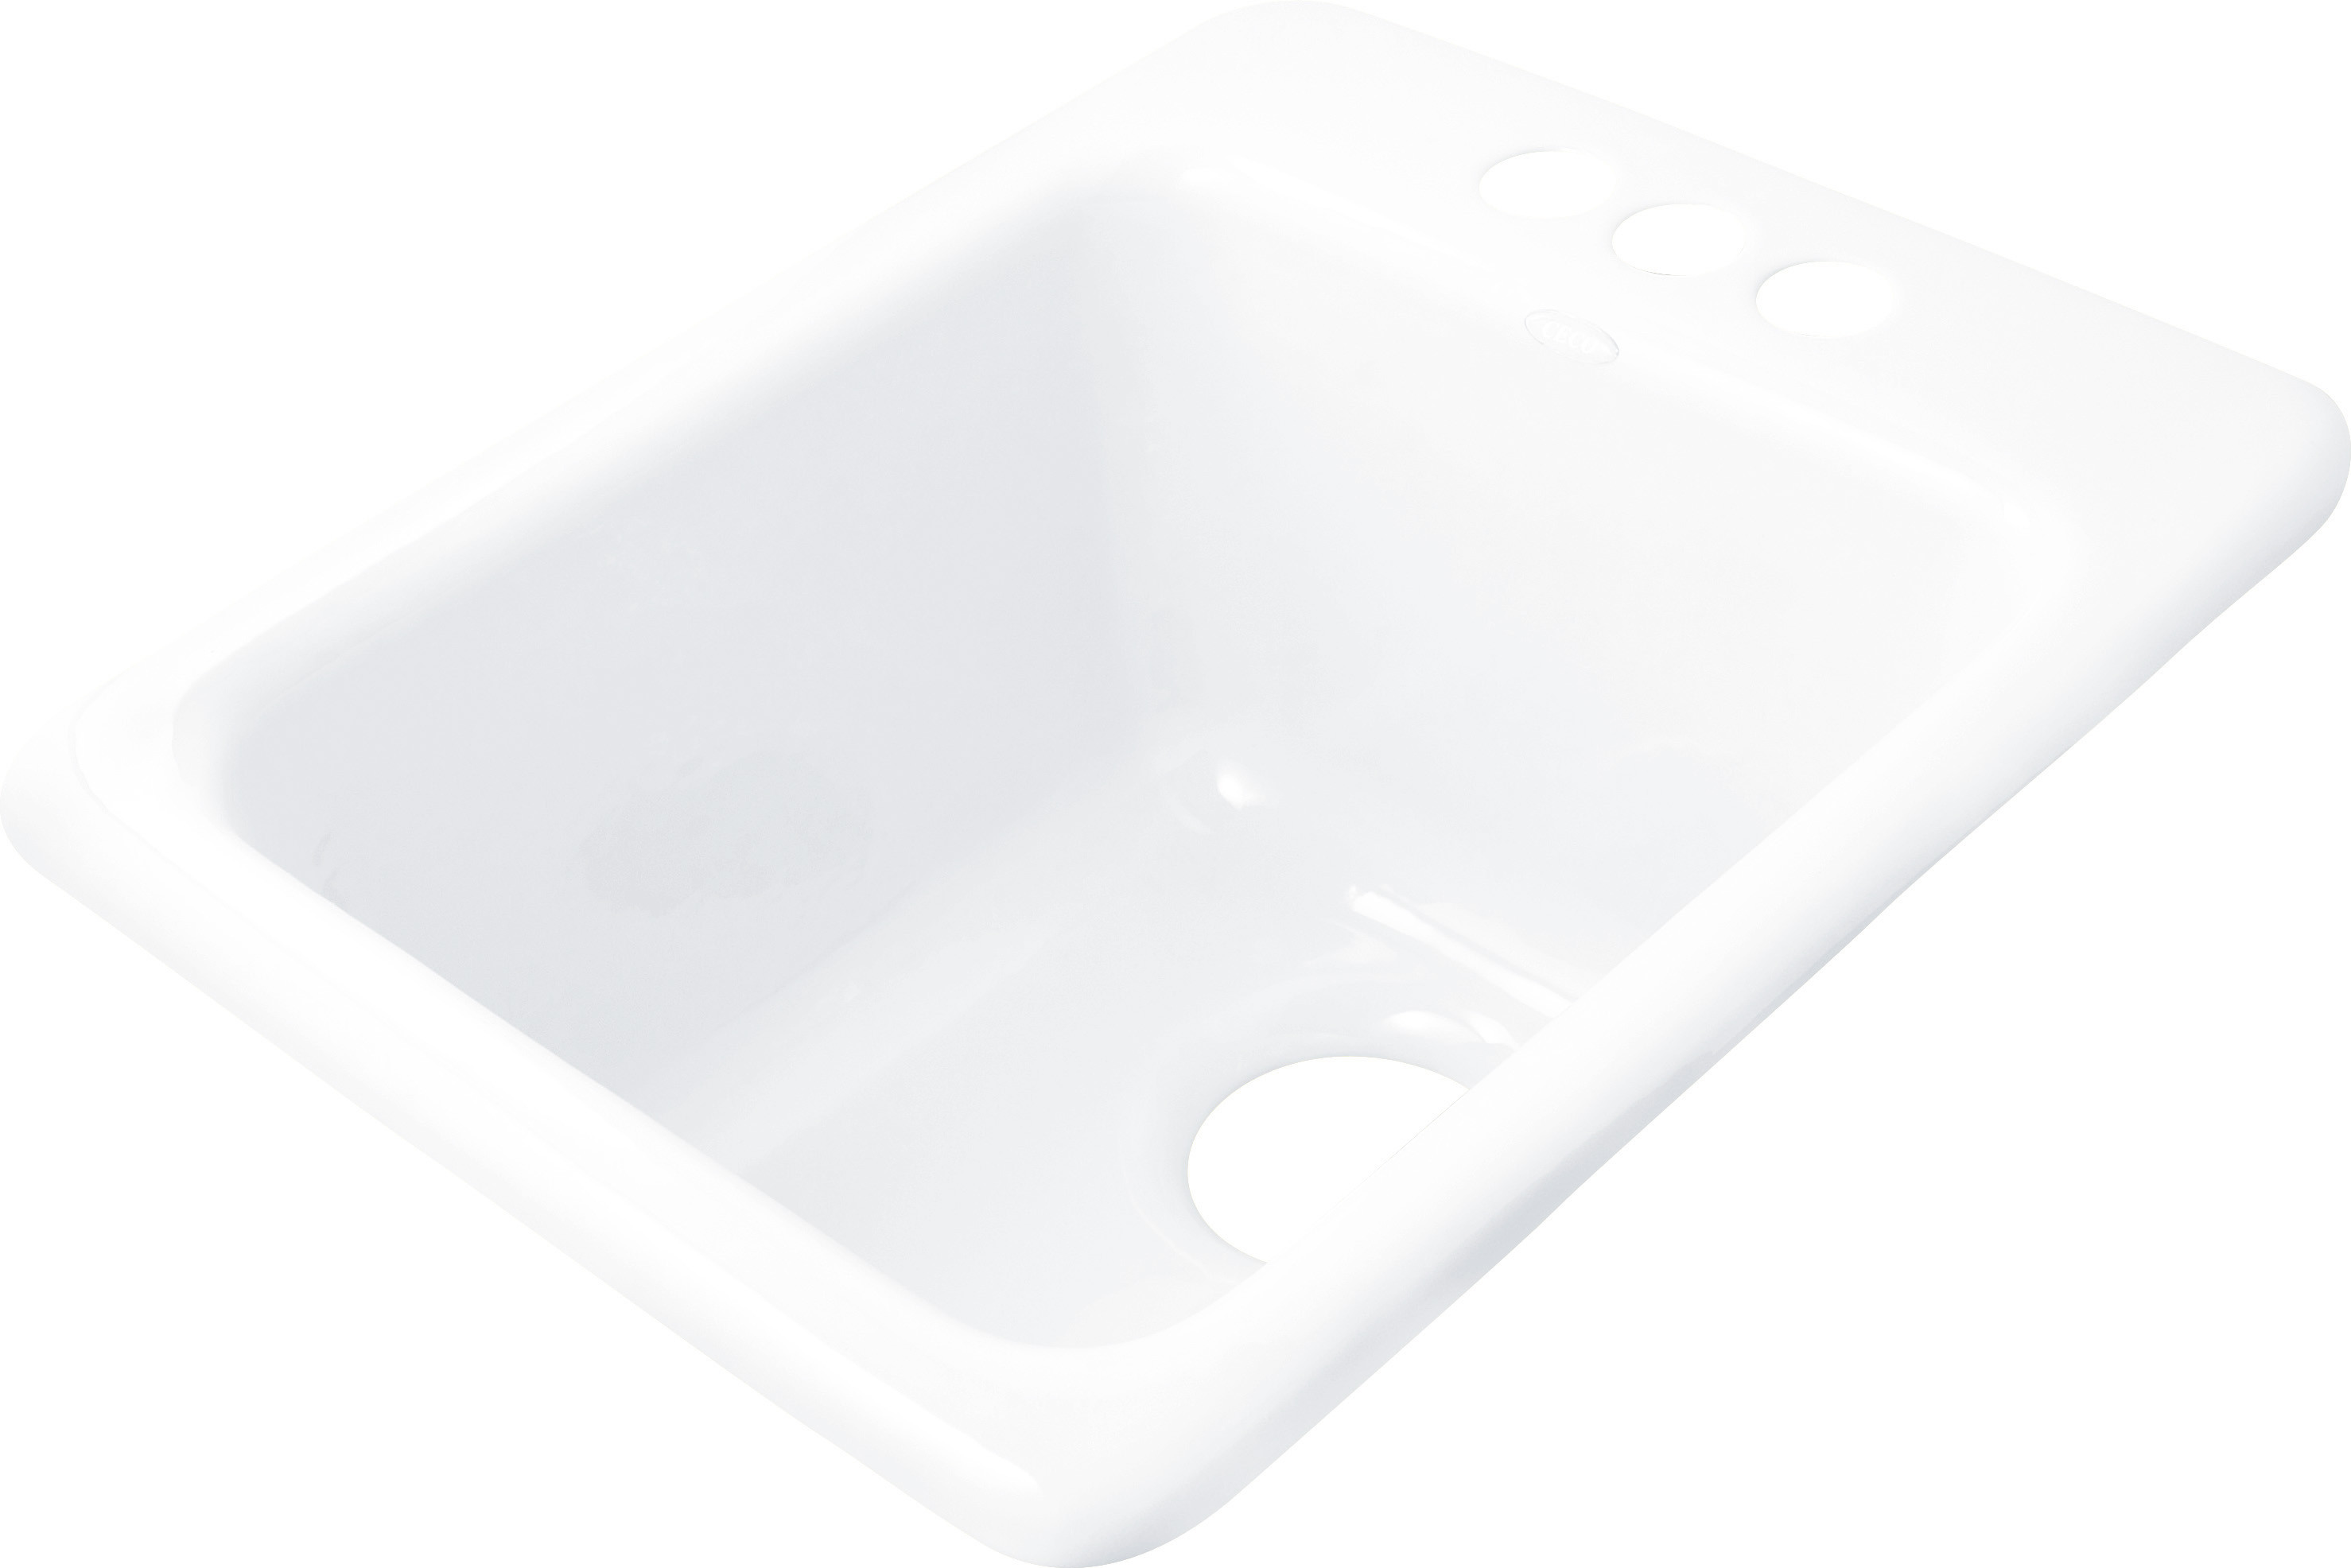 CECO 729-4 Bar or Island 16'' x 20'' x 9'' Heavy Cast Iron Self-Rimming Sink